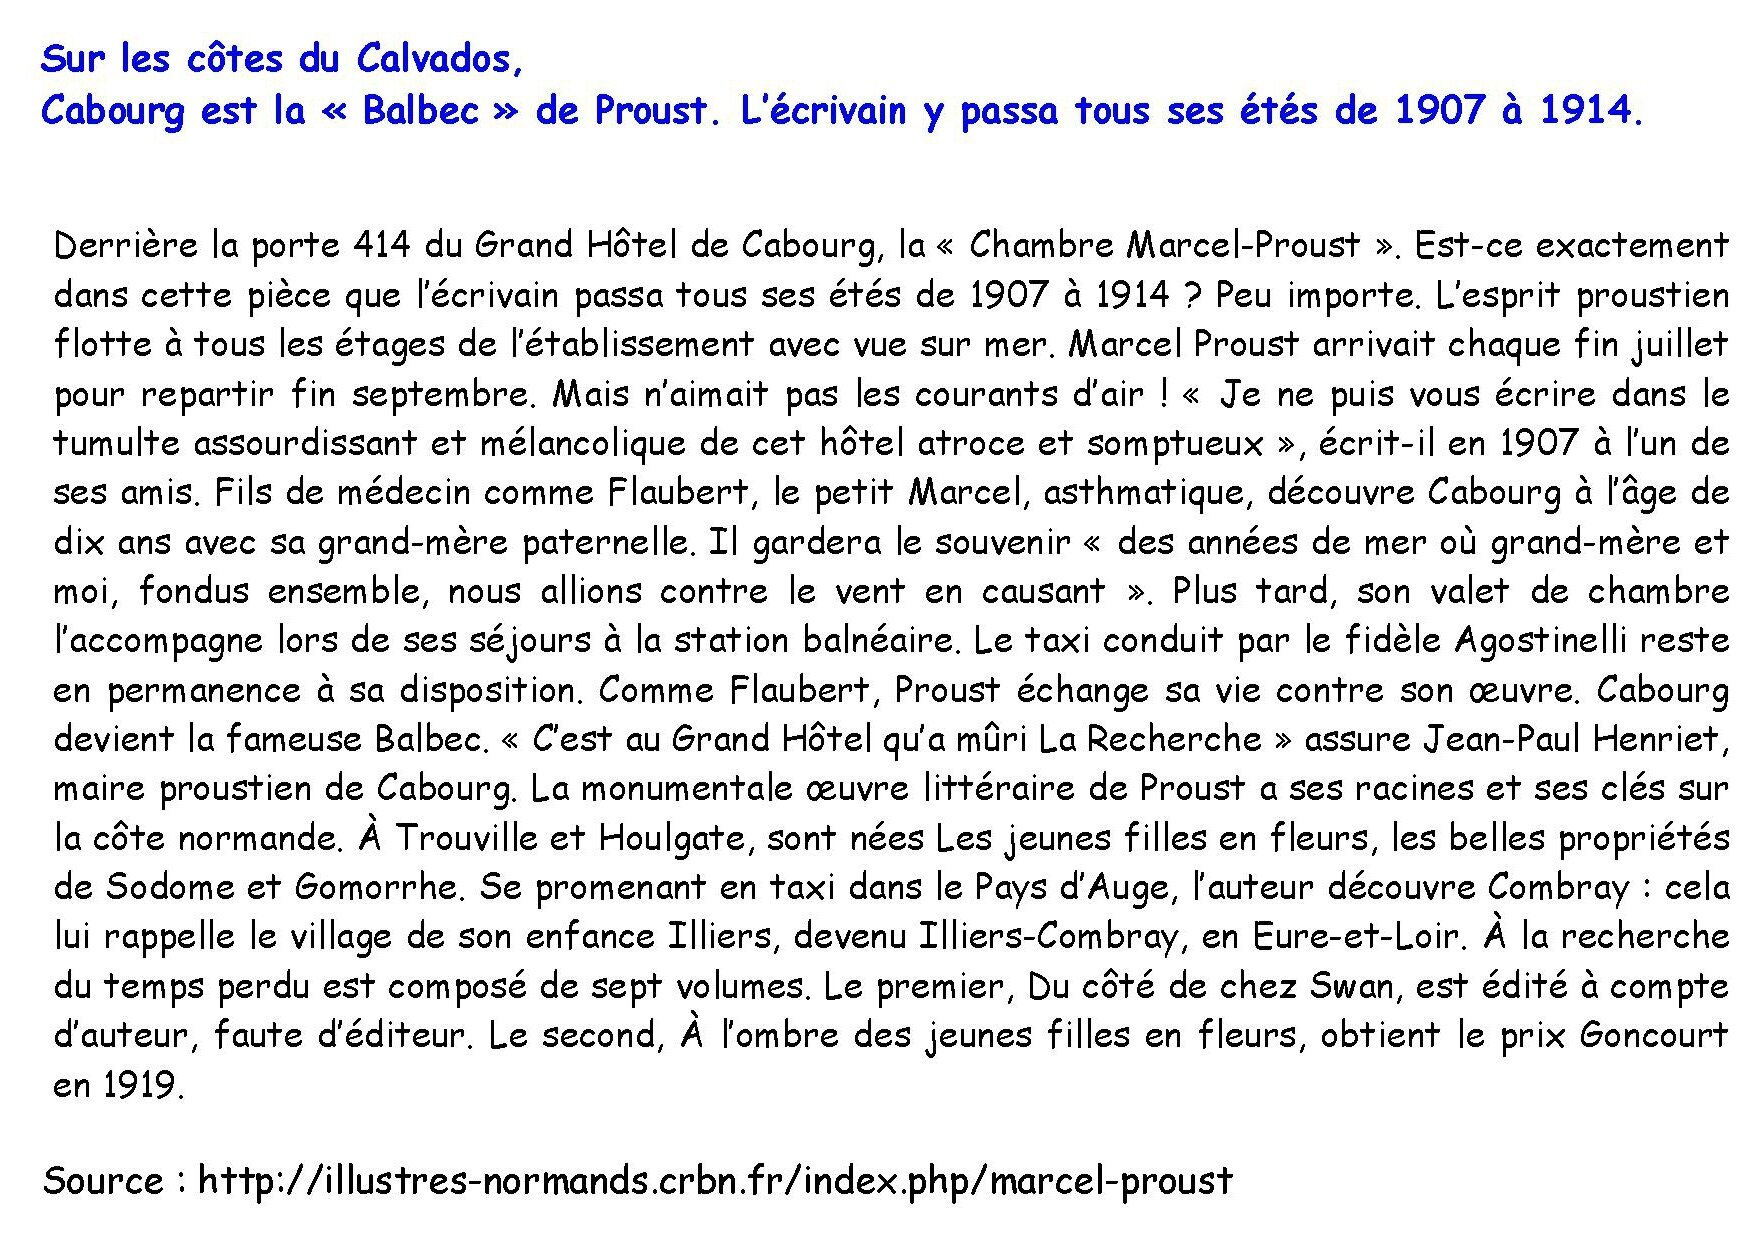 Marcel Proust commentaire